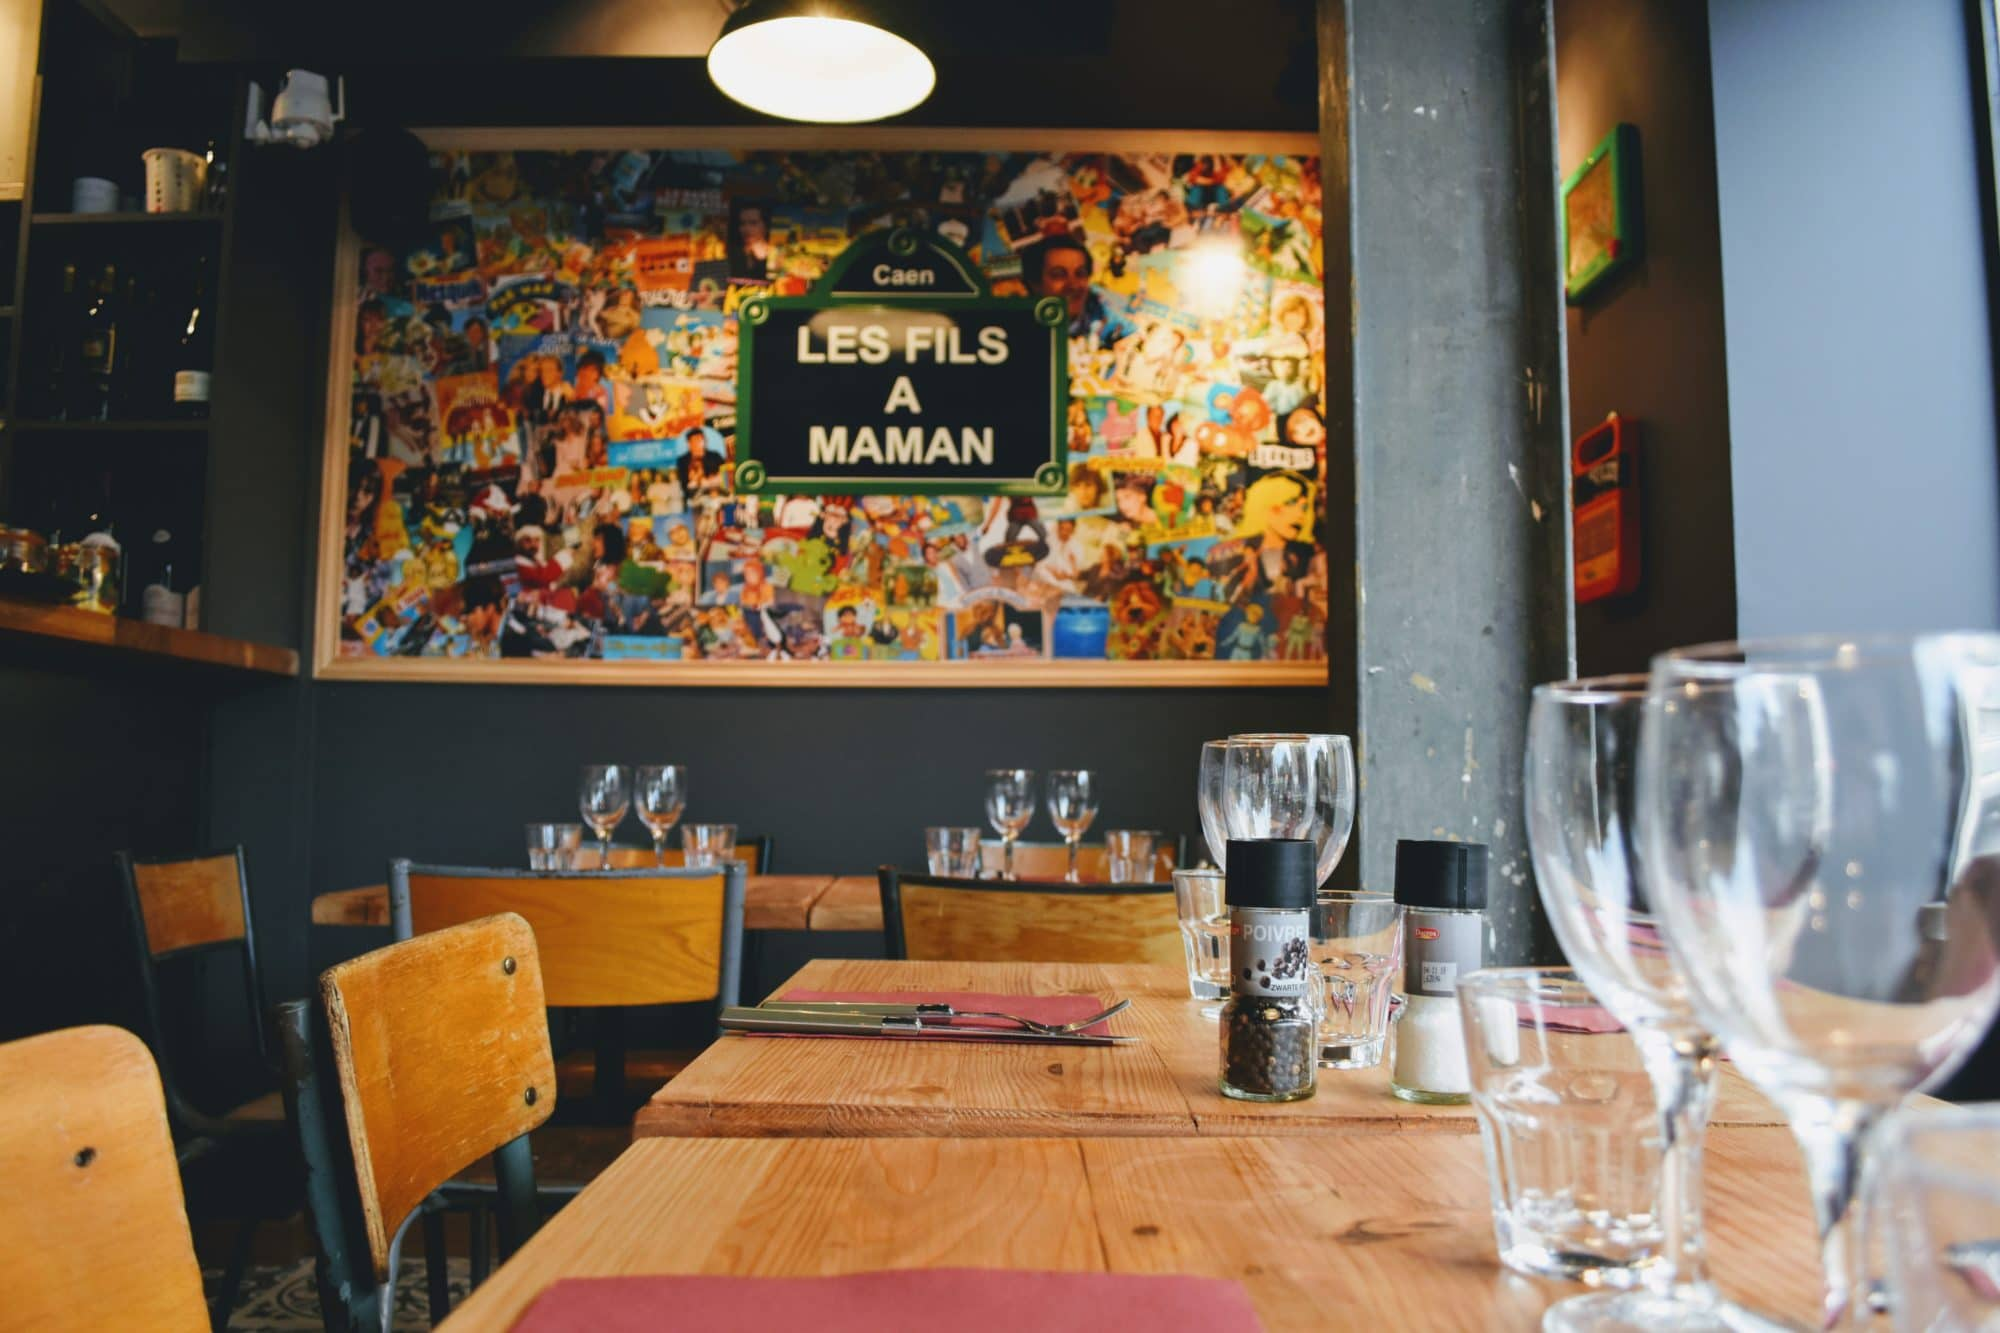 Salle ou terrasse de restaurant à Nantes Bouffay